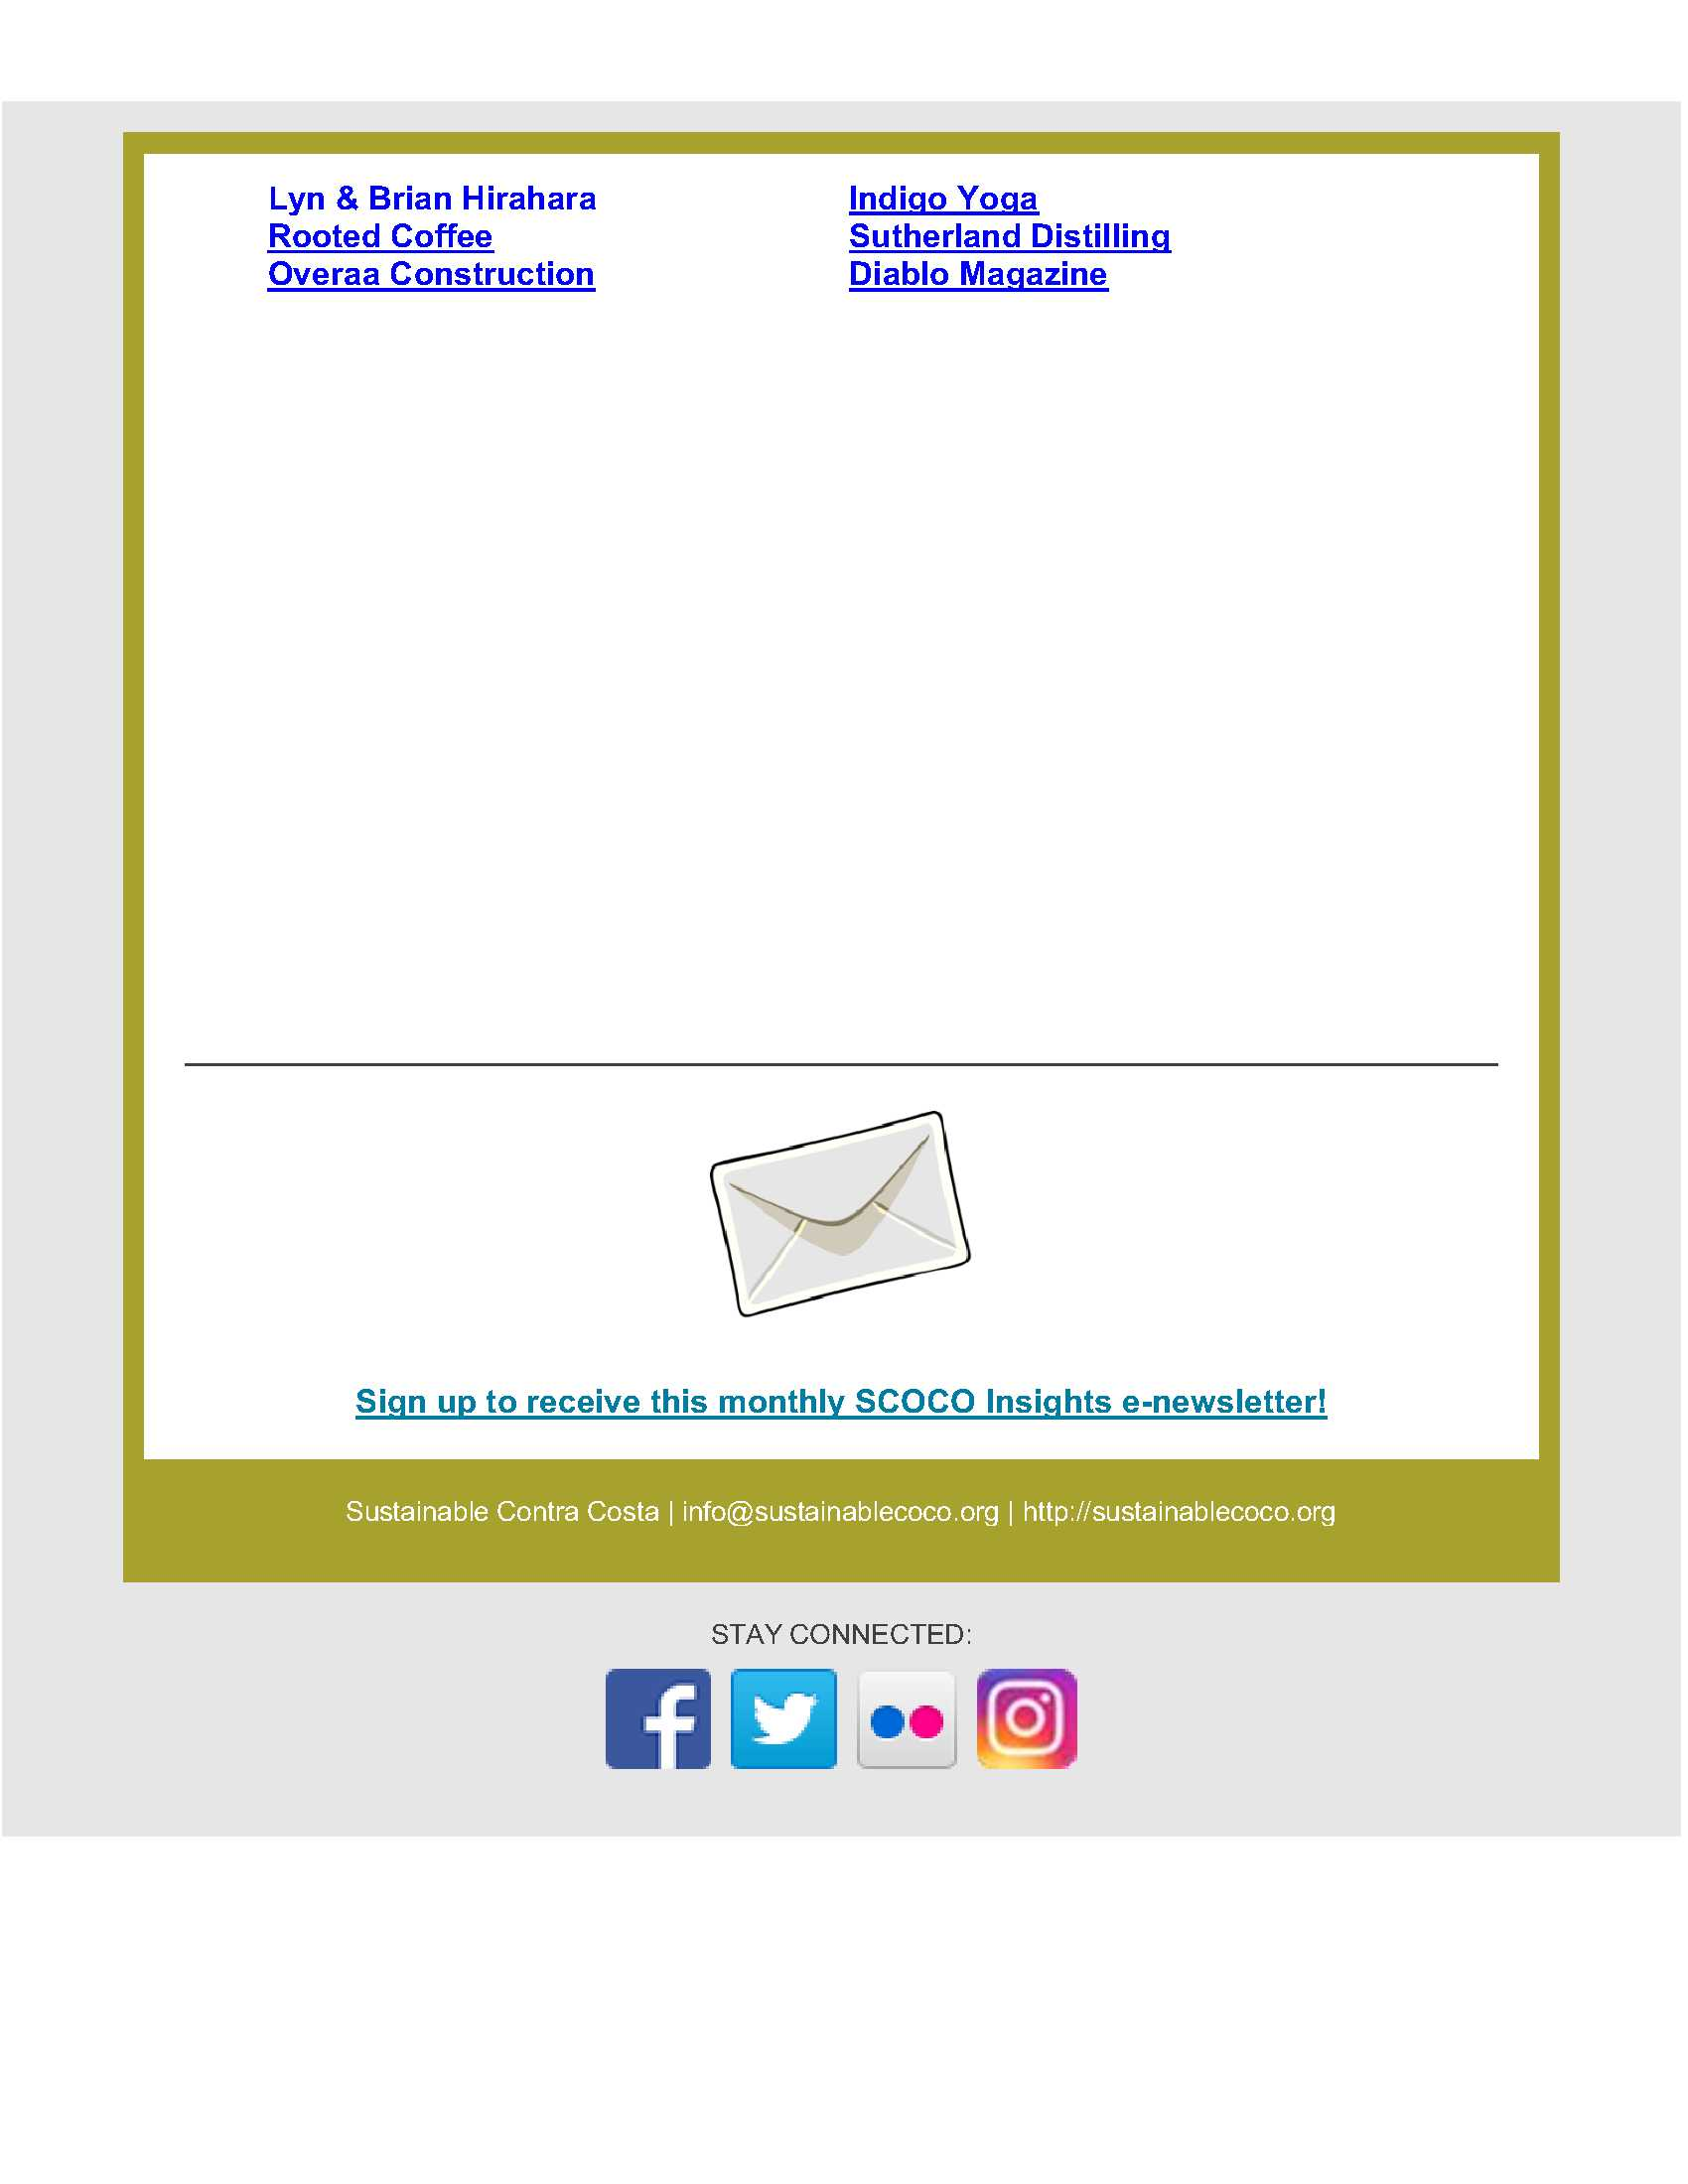 ESMAC Agenda 12.13.2018 (51 Pages)_43.jpg